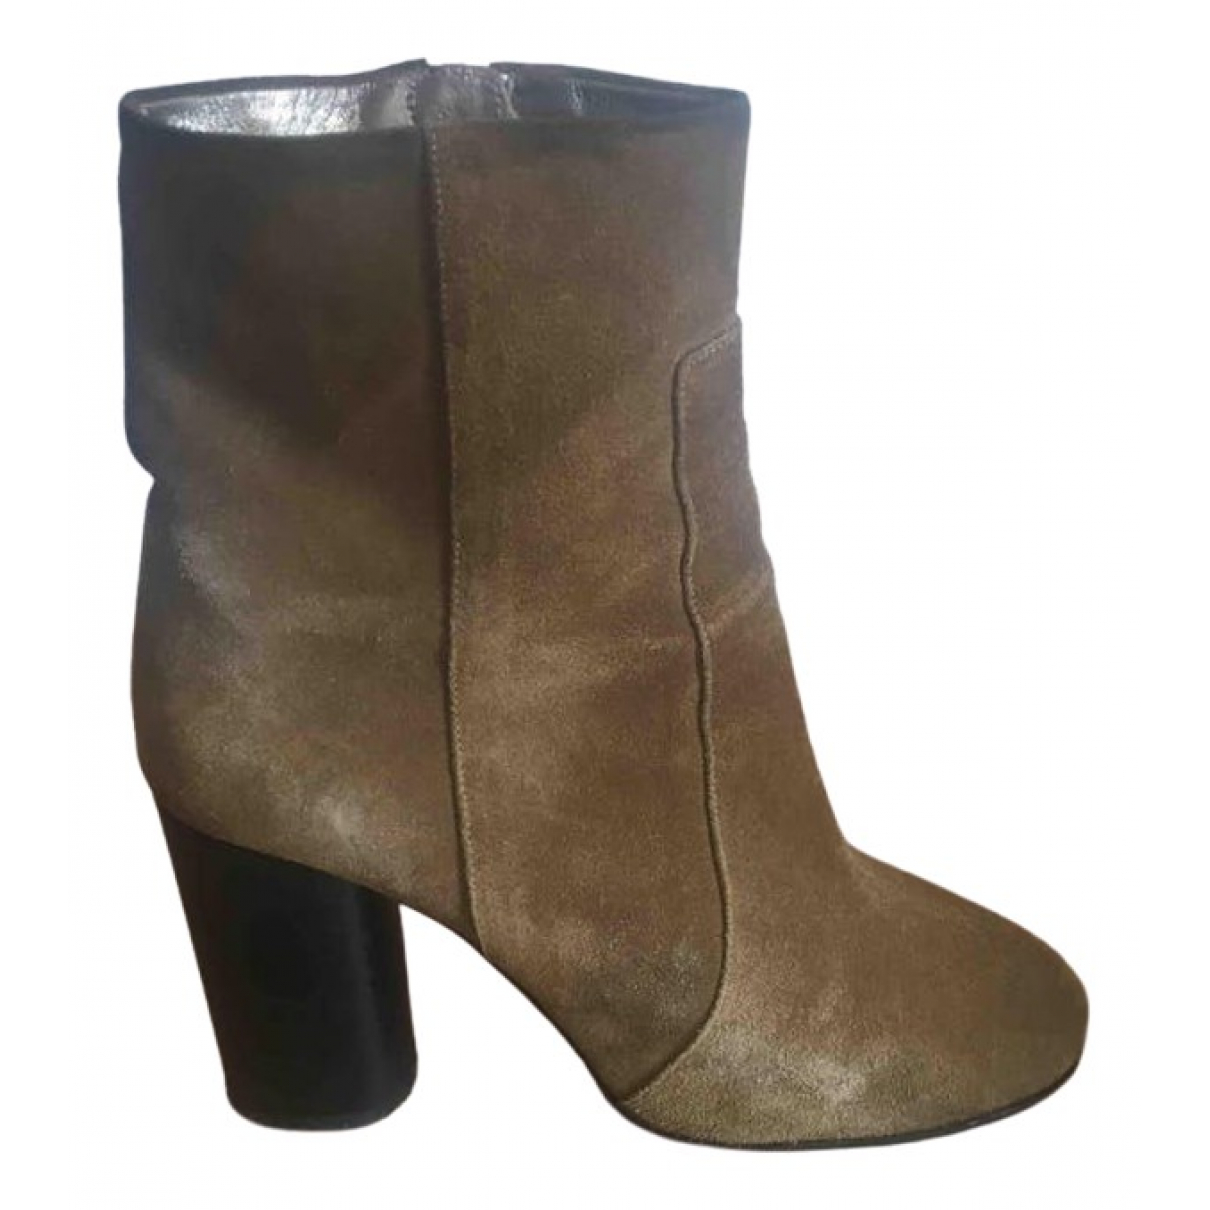 Isabel Marant Garett Camel Suede Ankle boots for Women 38 EU